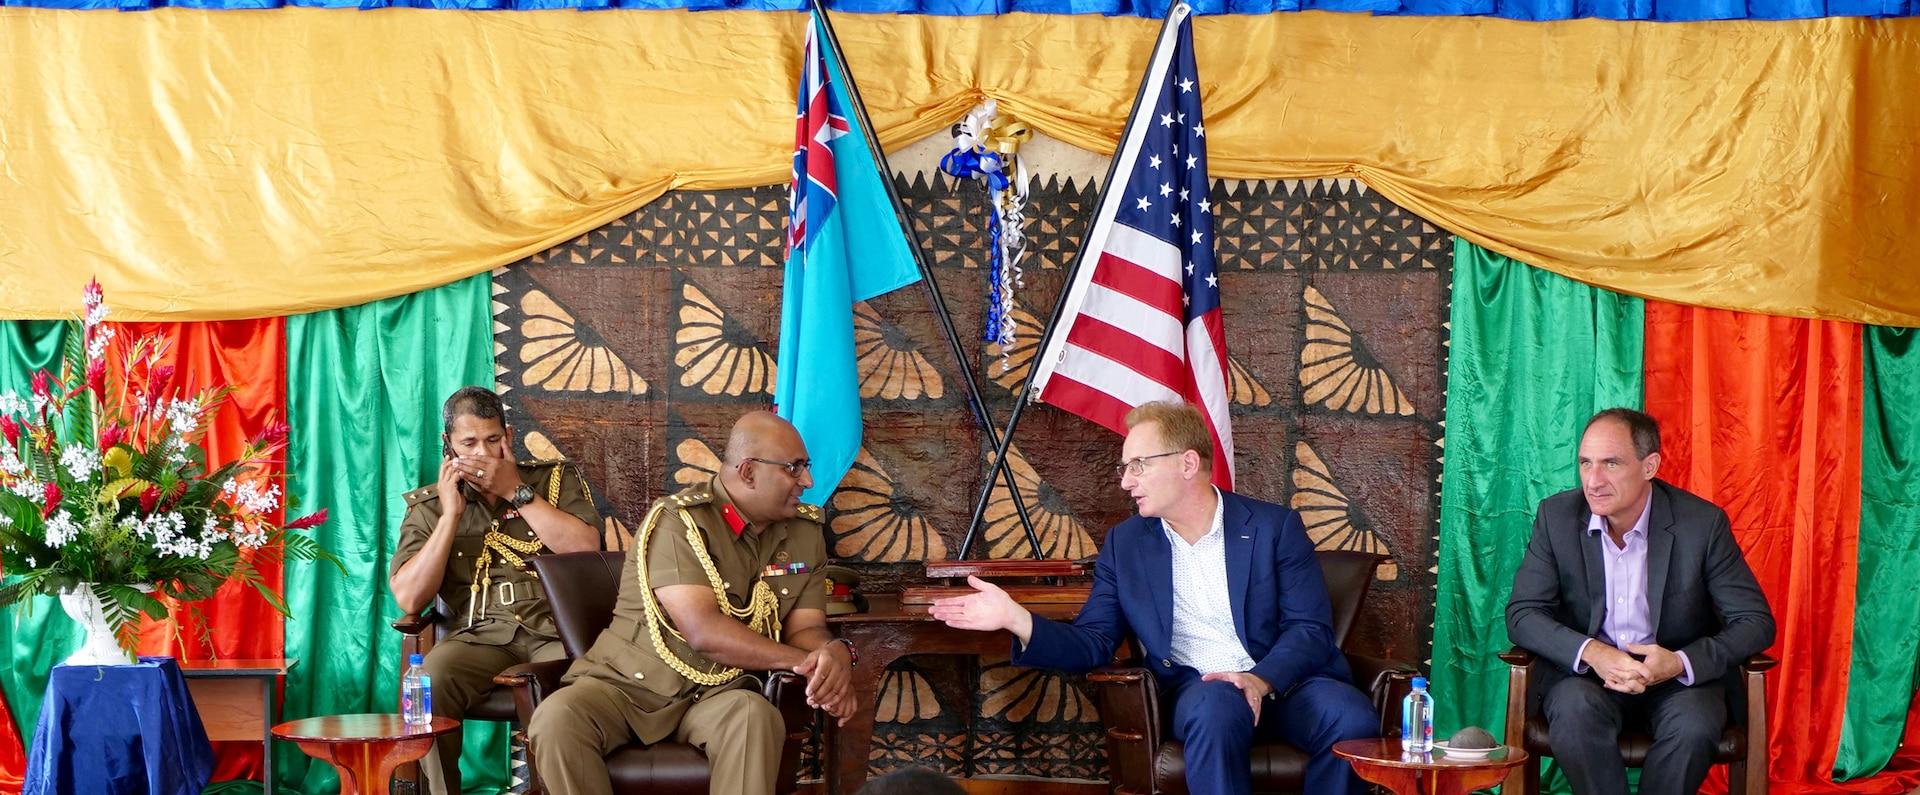 Under SECNAV Visits Fiji for Partnership Building